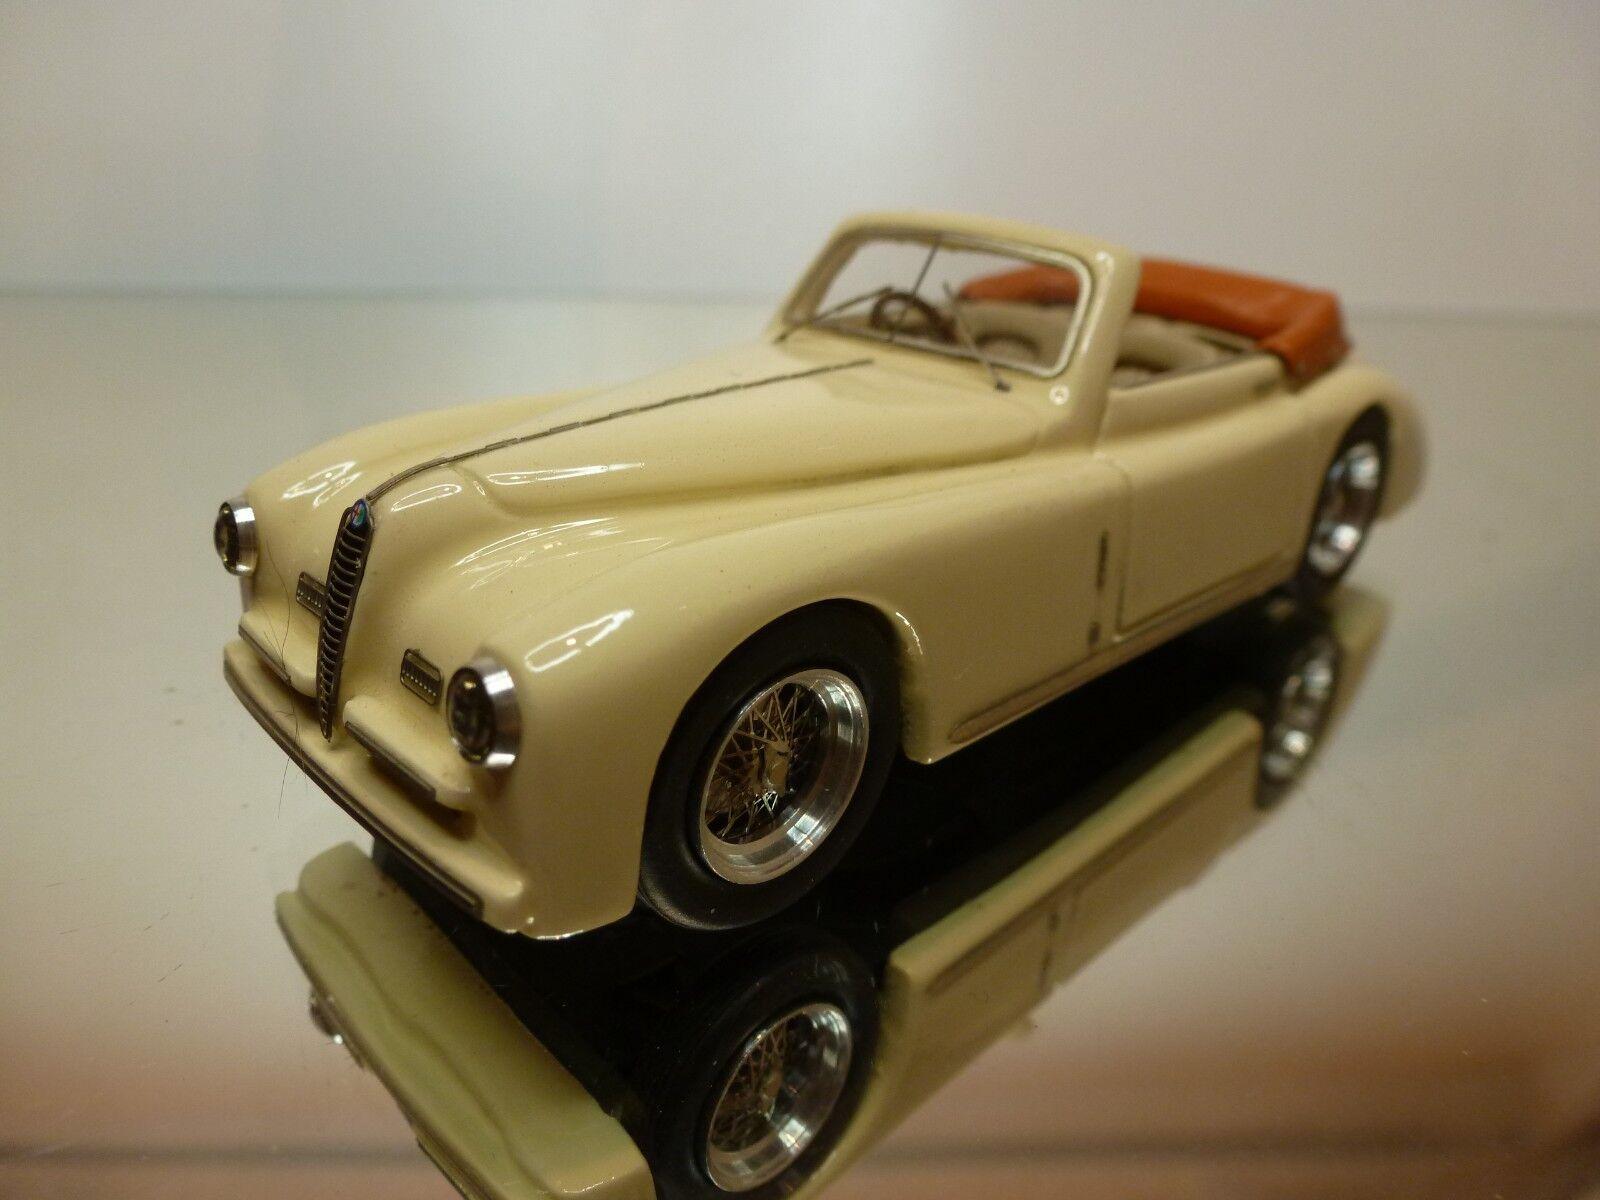 ALFA MODEL ALFA ROMEO 6C 2500S PININFARINA 1947 - CREAM 1 43 - EXCELLENT - 19